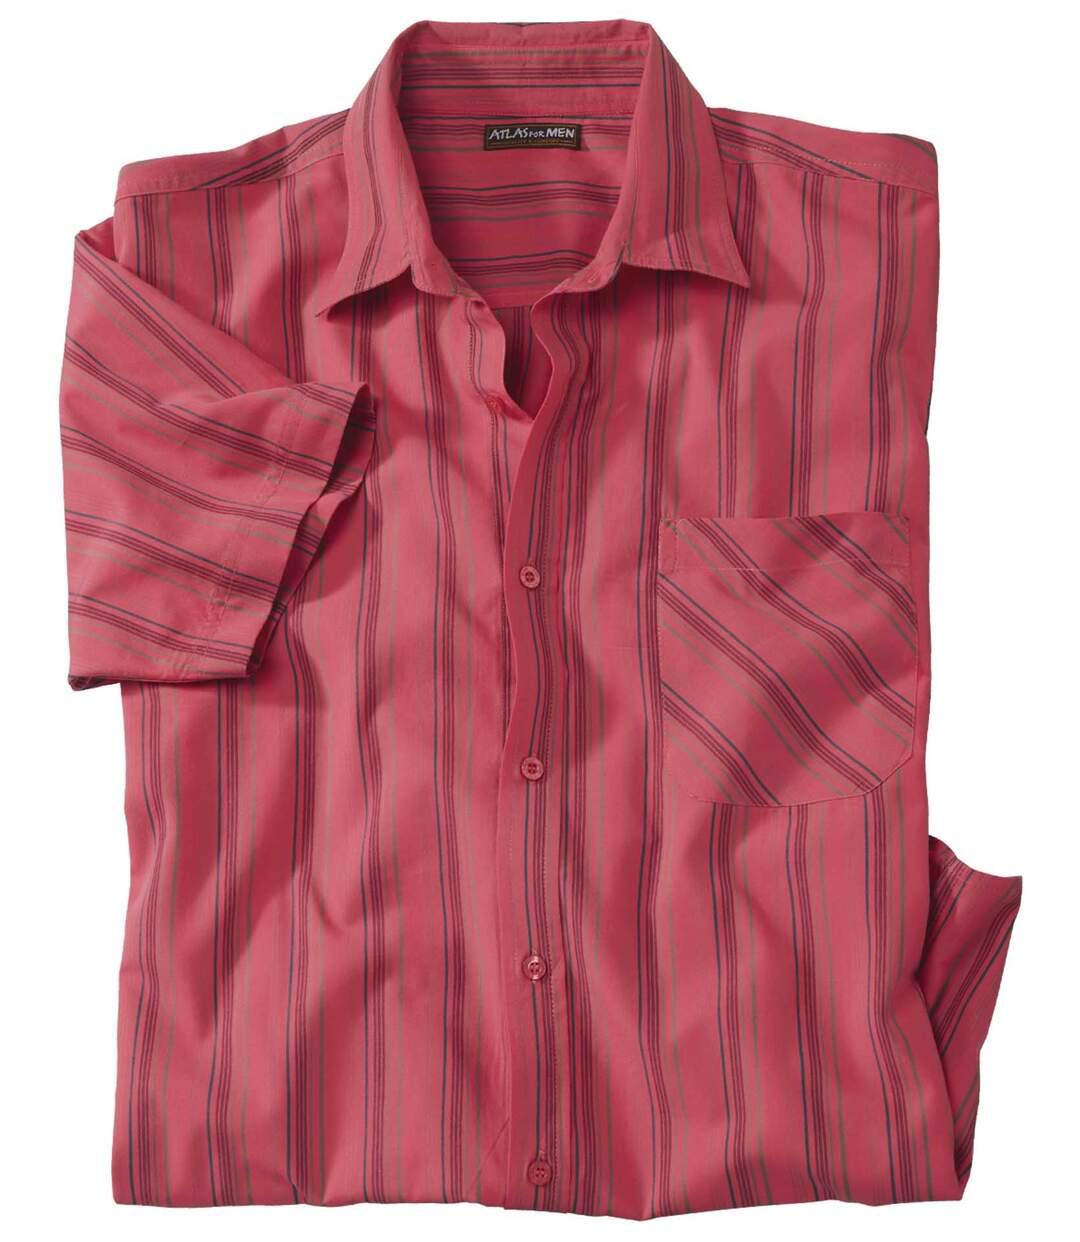 Men's Coral Short Sleeve Shirt - Palm Sun